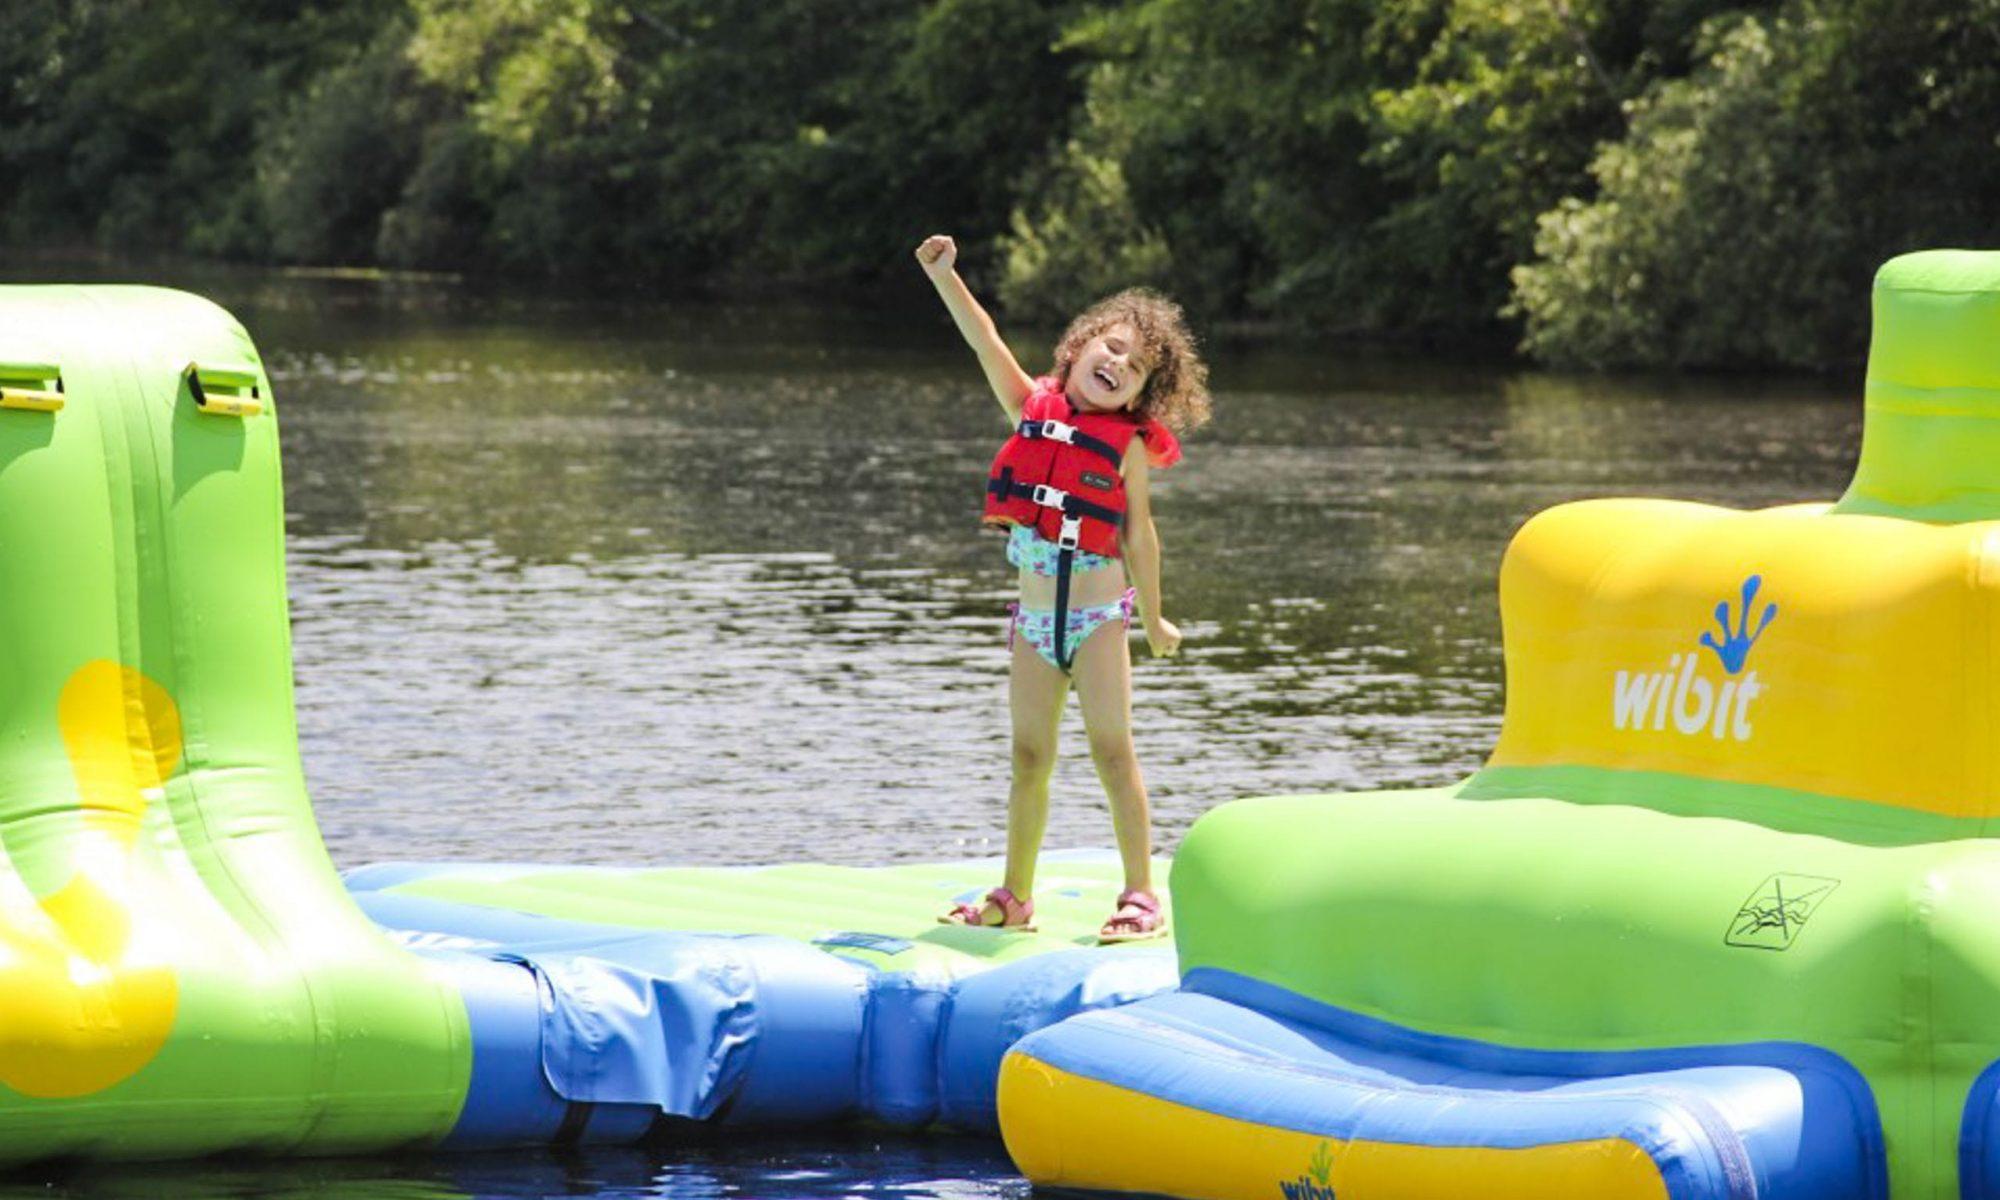 Girl on Wibit during swim activity